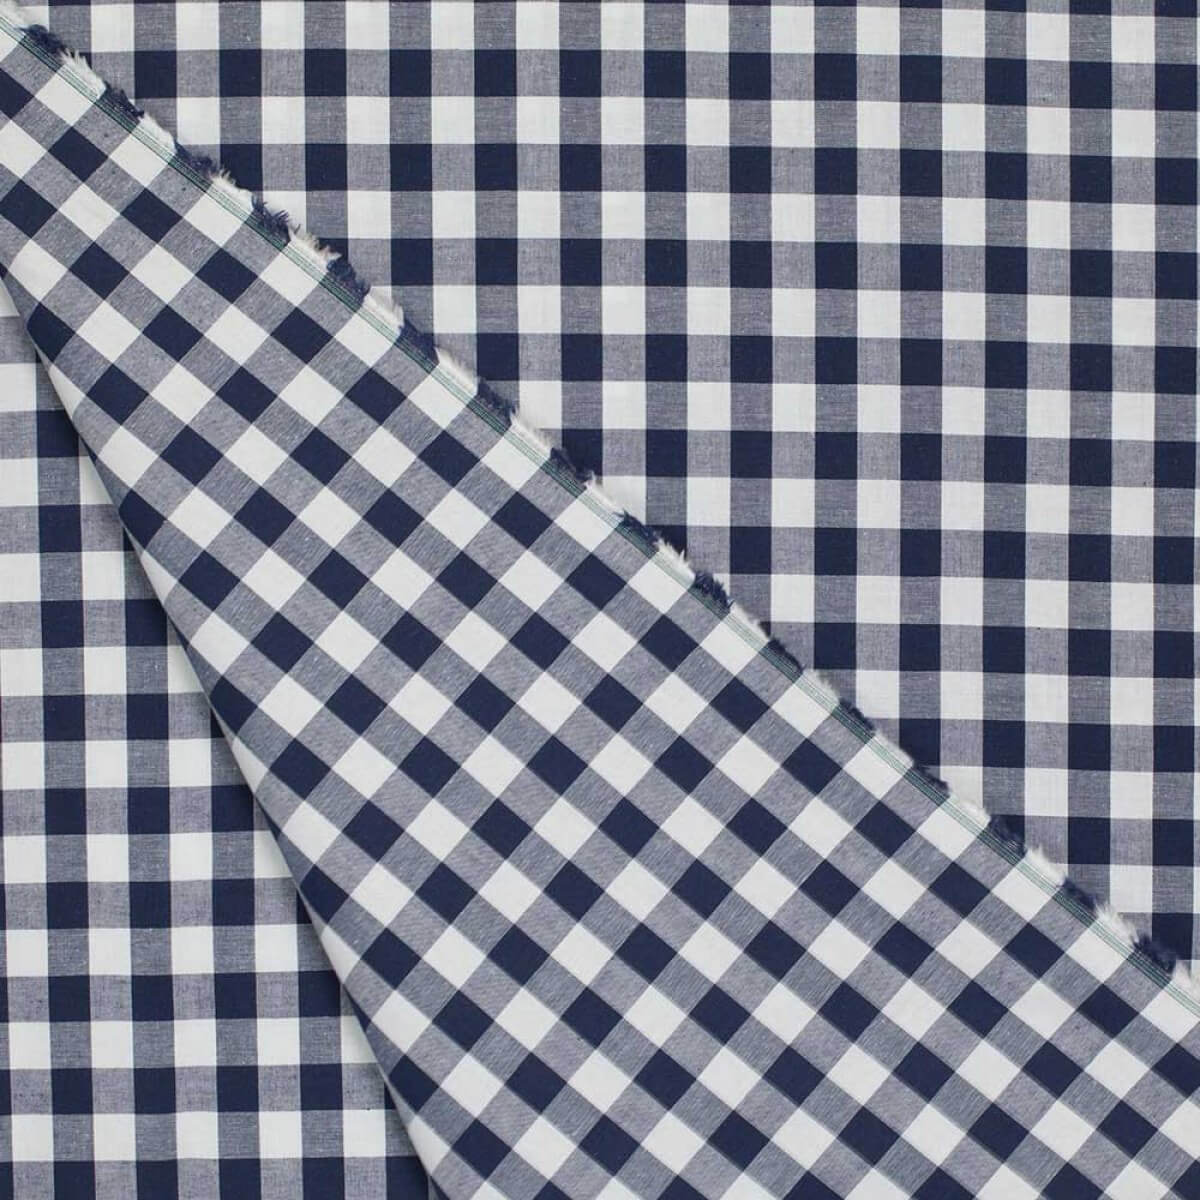 tissu vichy bleu marine blanc grand carreaux 2 cm. Black Bedroom Furniture Sets. Home Design Ideas